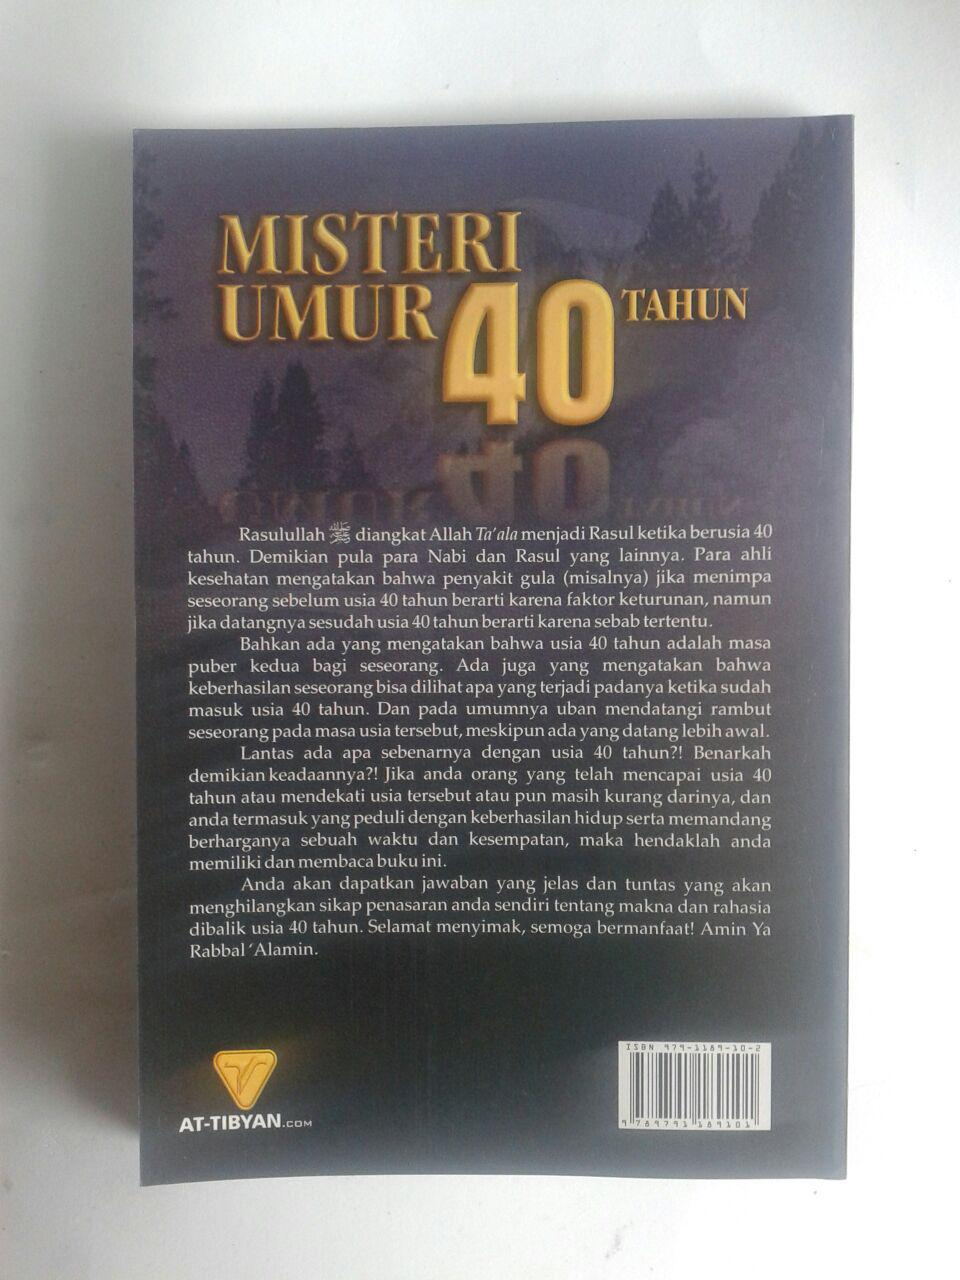 Buku Misteri Umur 40 Tahun isi 2